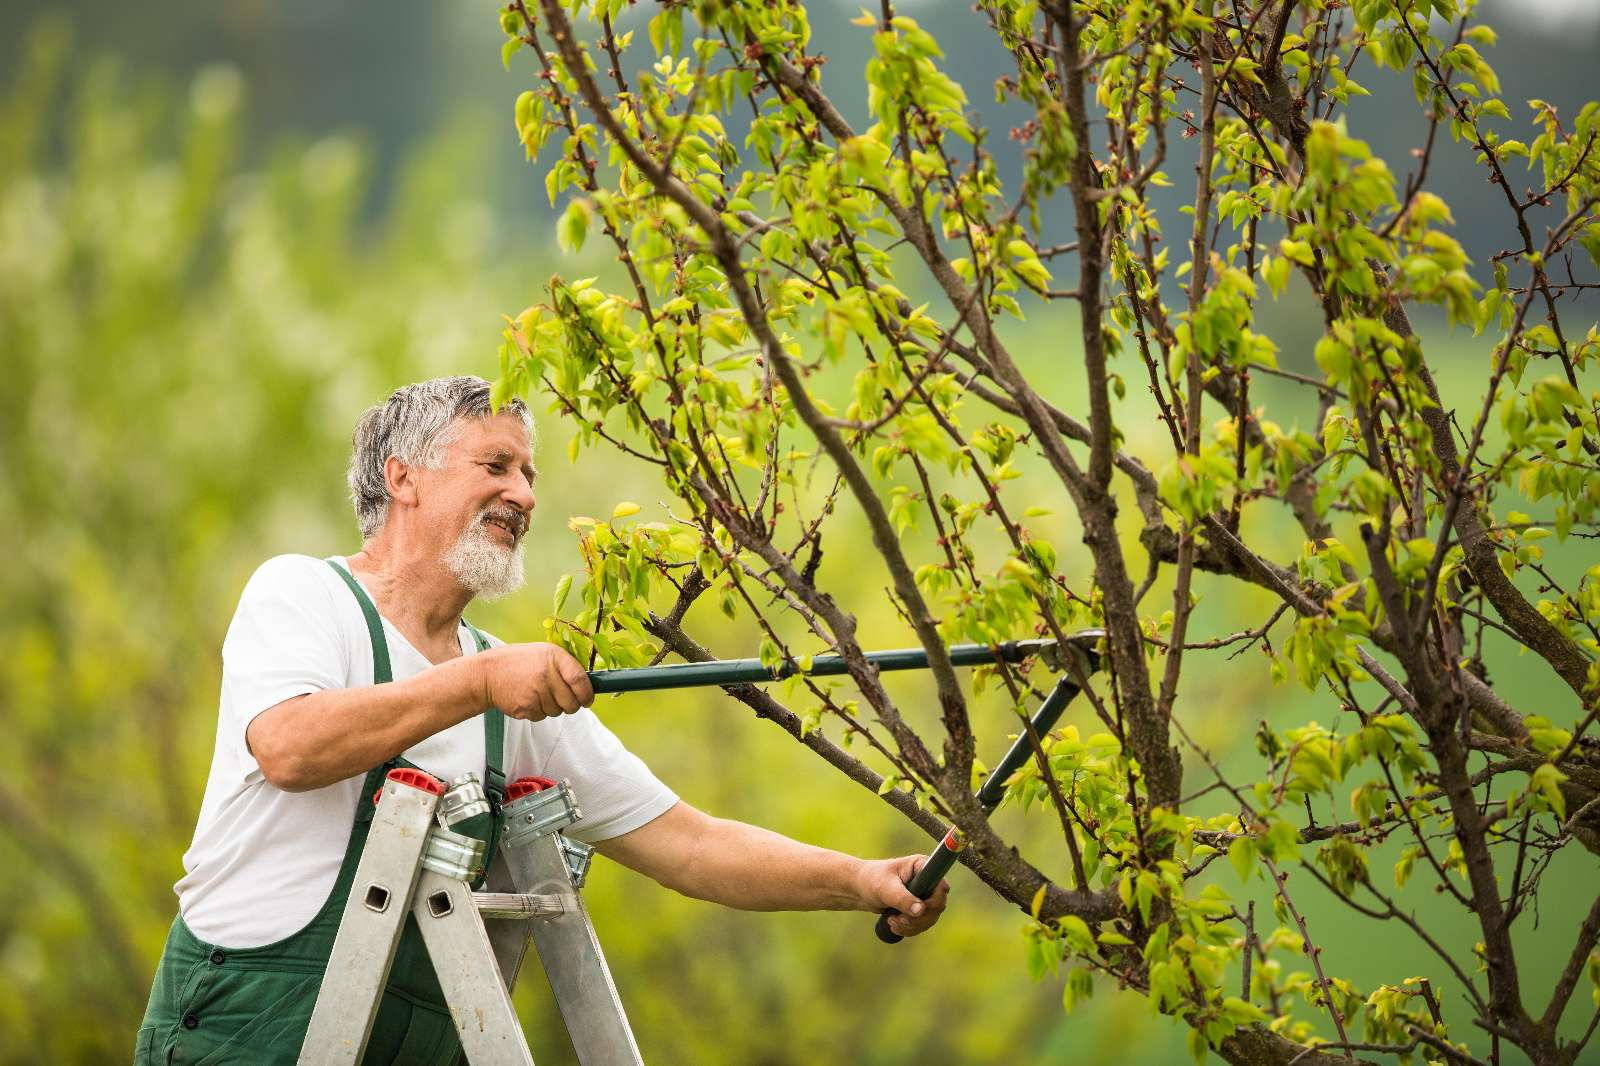 Baumschnitt: Sommerschnitt und Winterschnitt